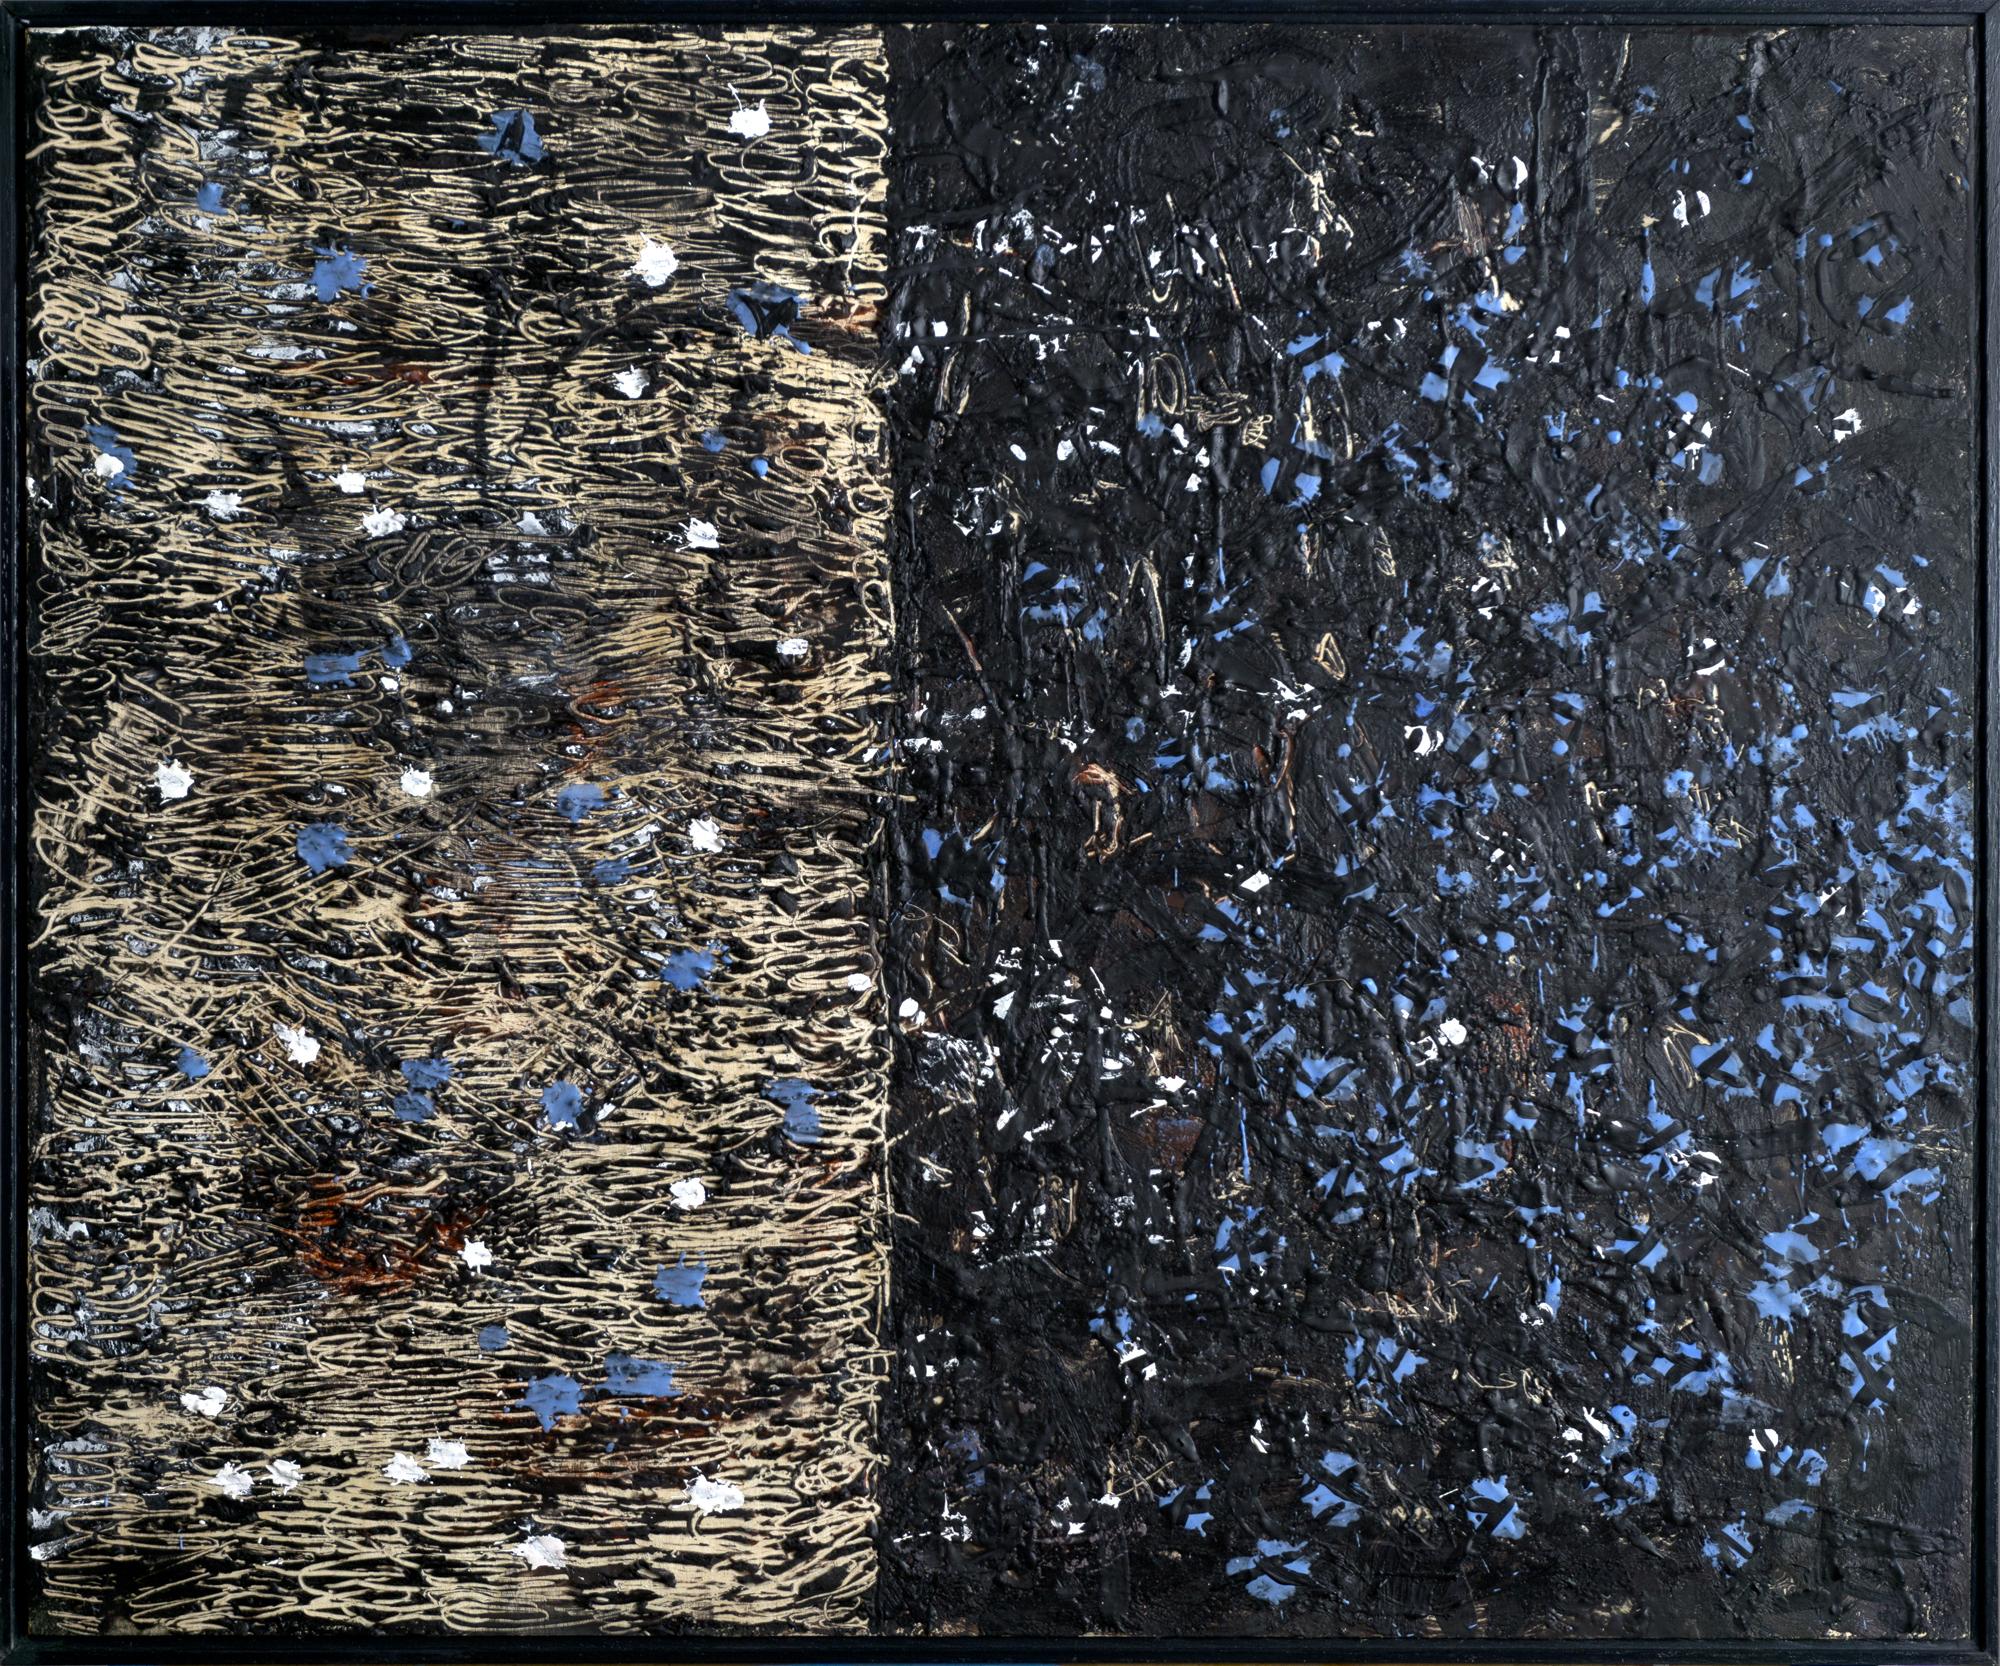 Chrissy's Black Painting